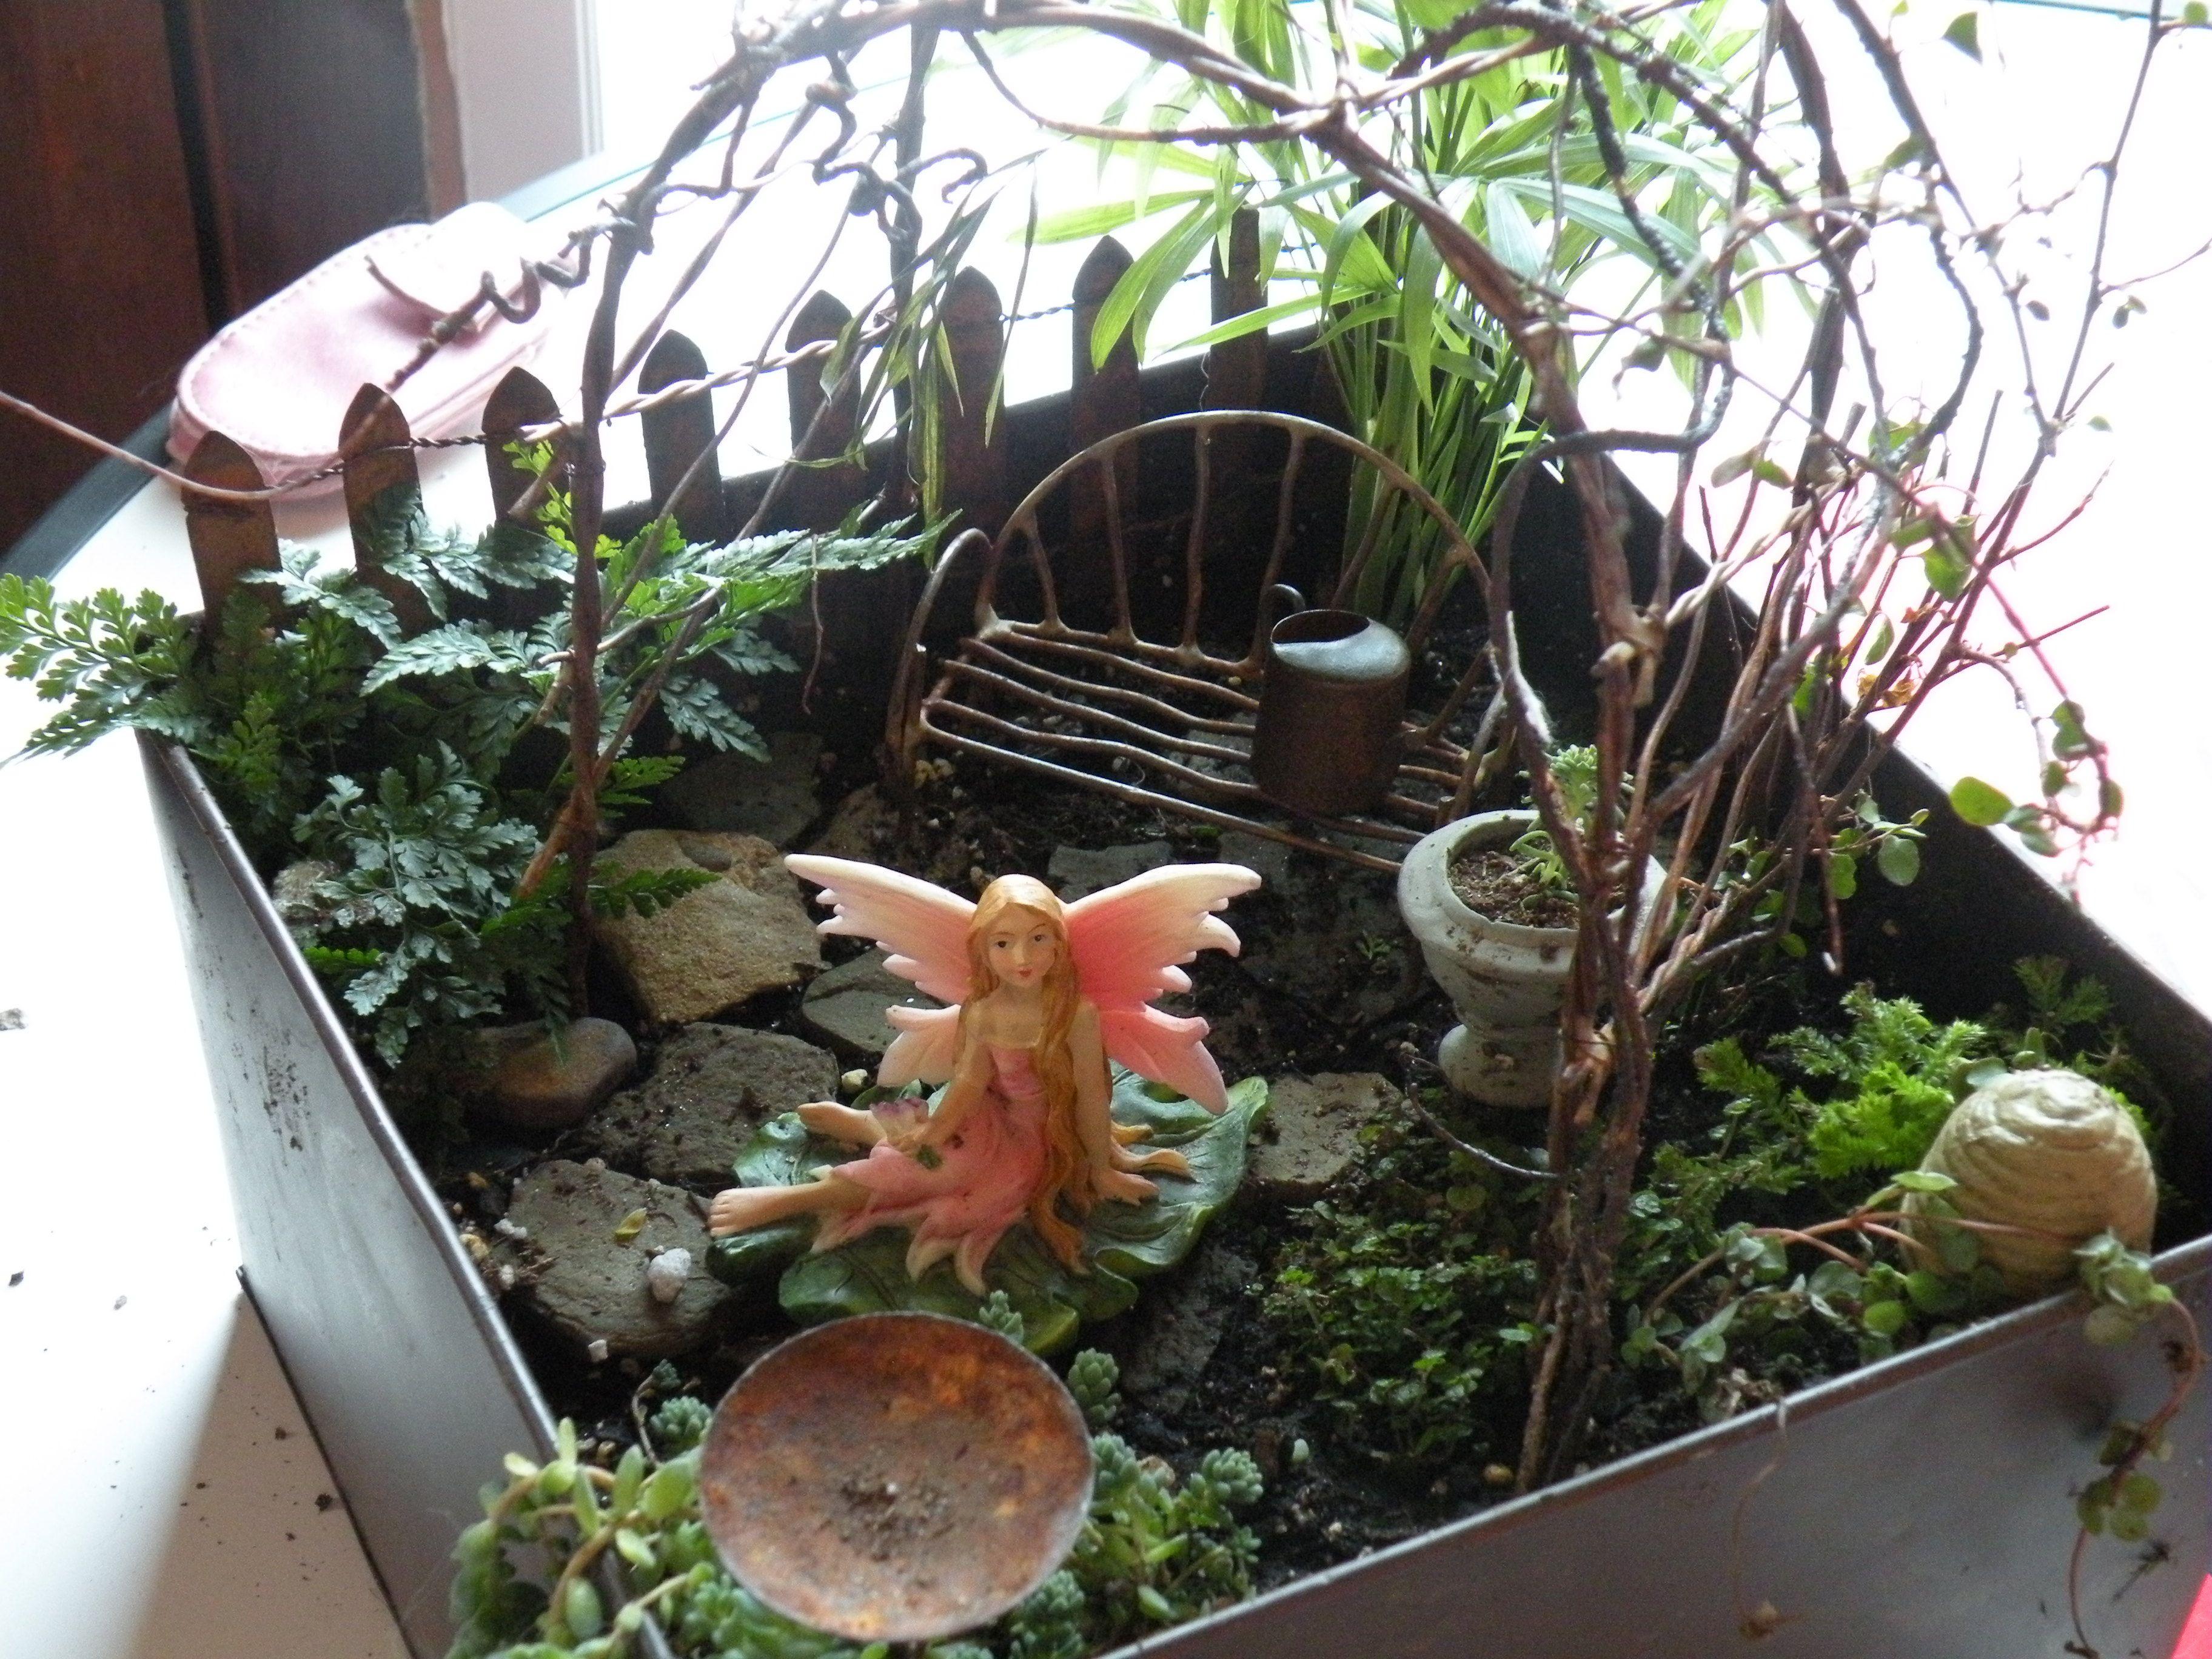 indoor fairygarden fairy gardens and such pinterest. Black Bedroom Furniture Sets. Home Design Ideas